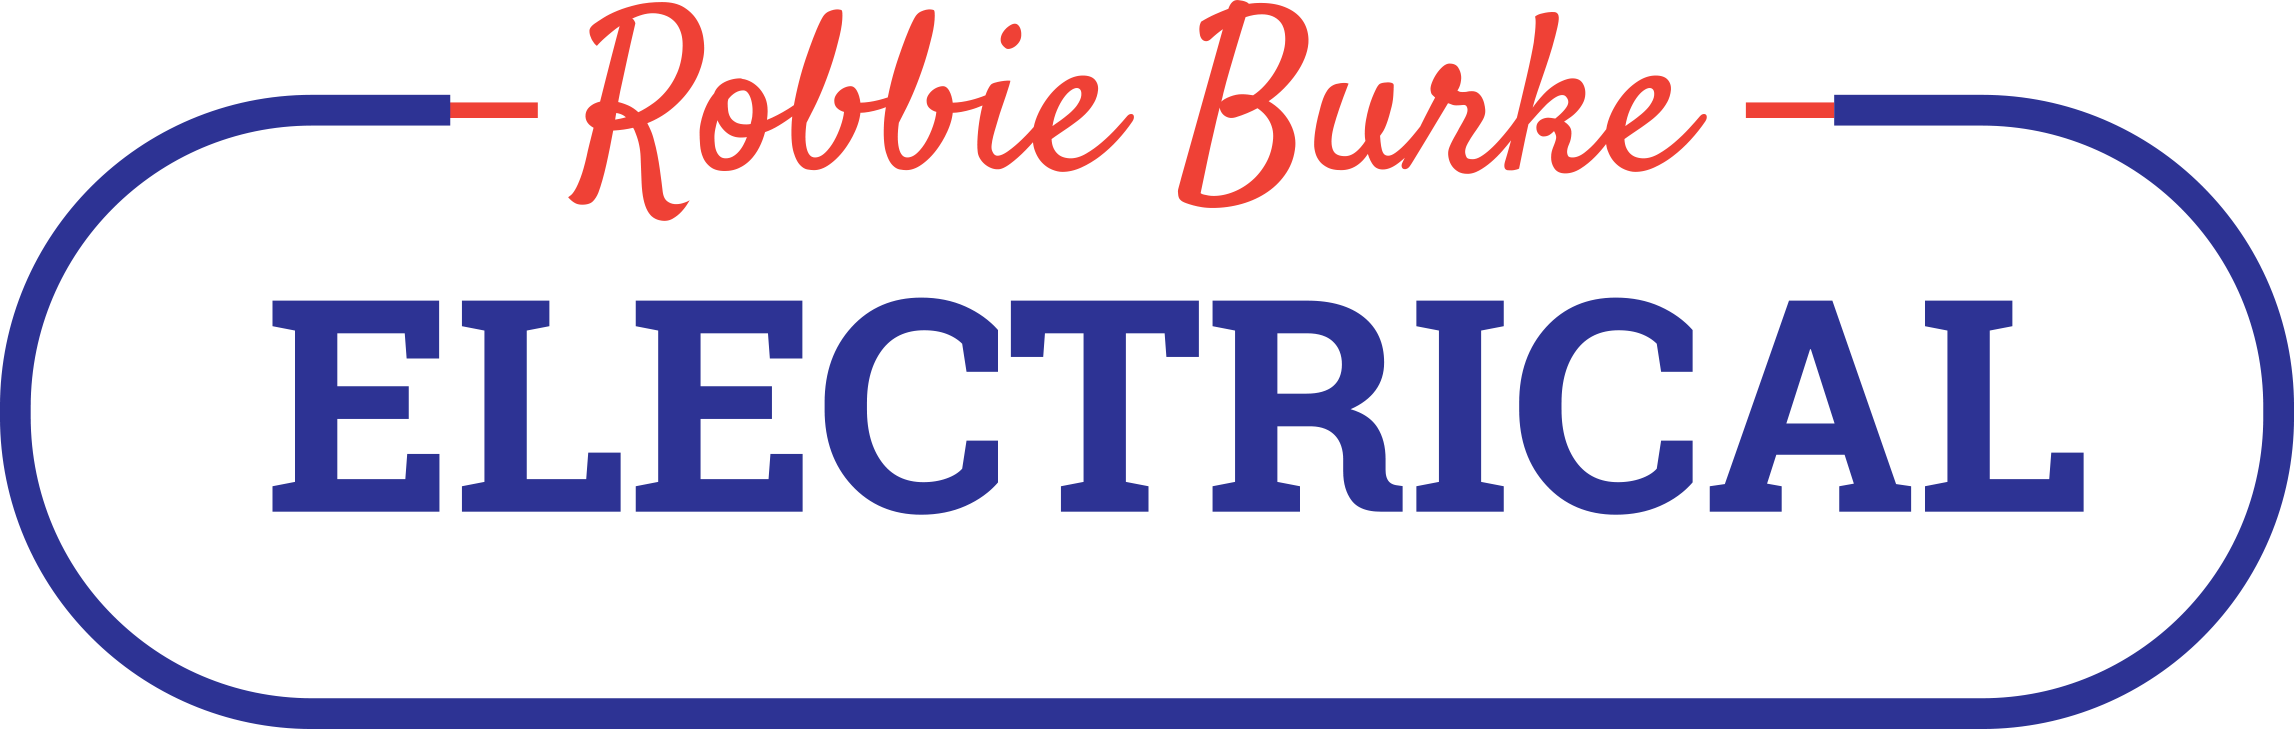 Robbie Burke Electrical Logo